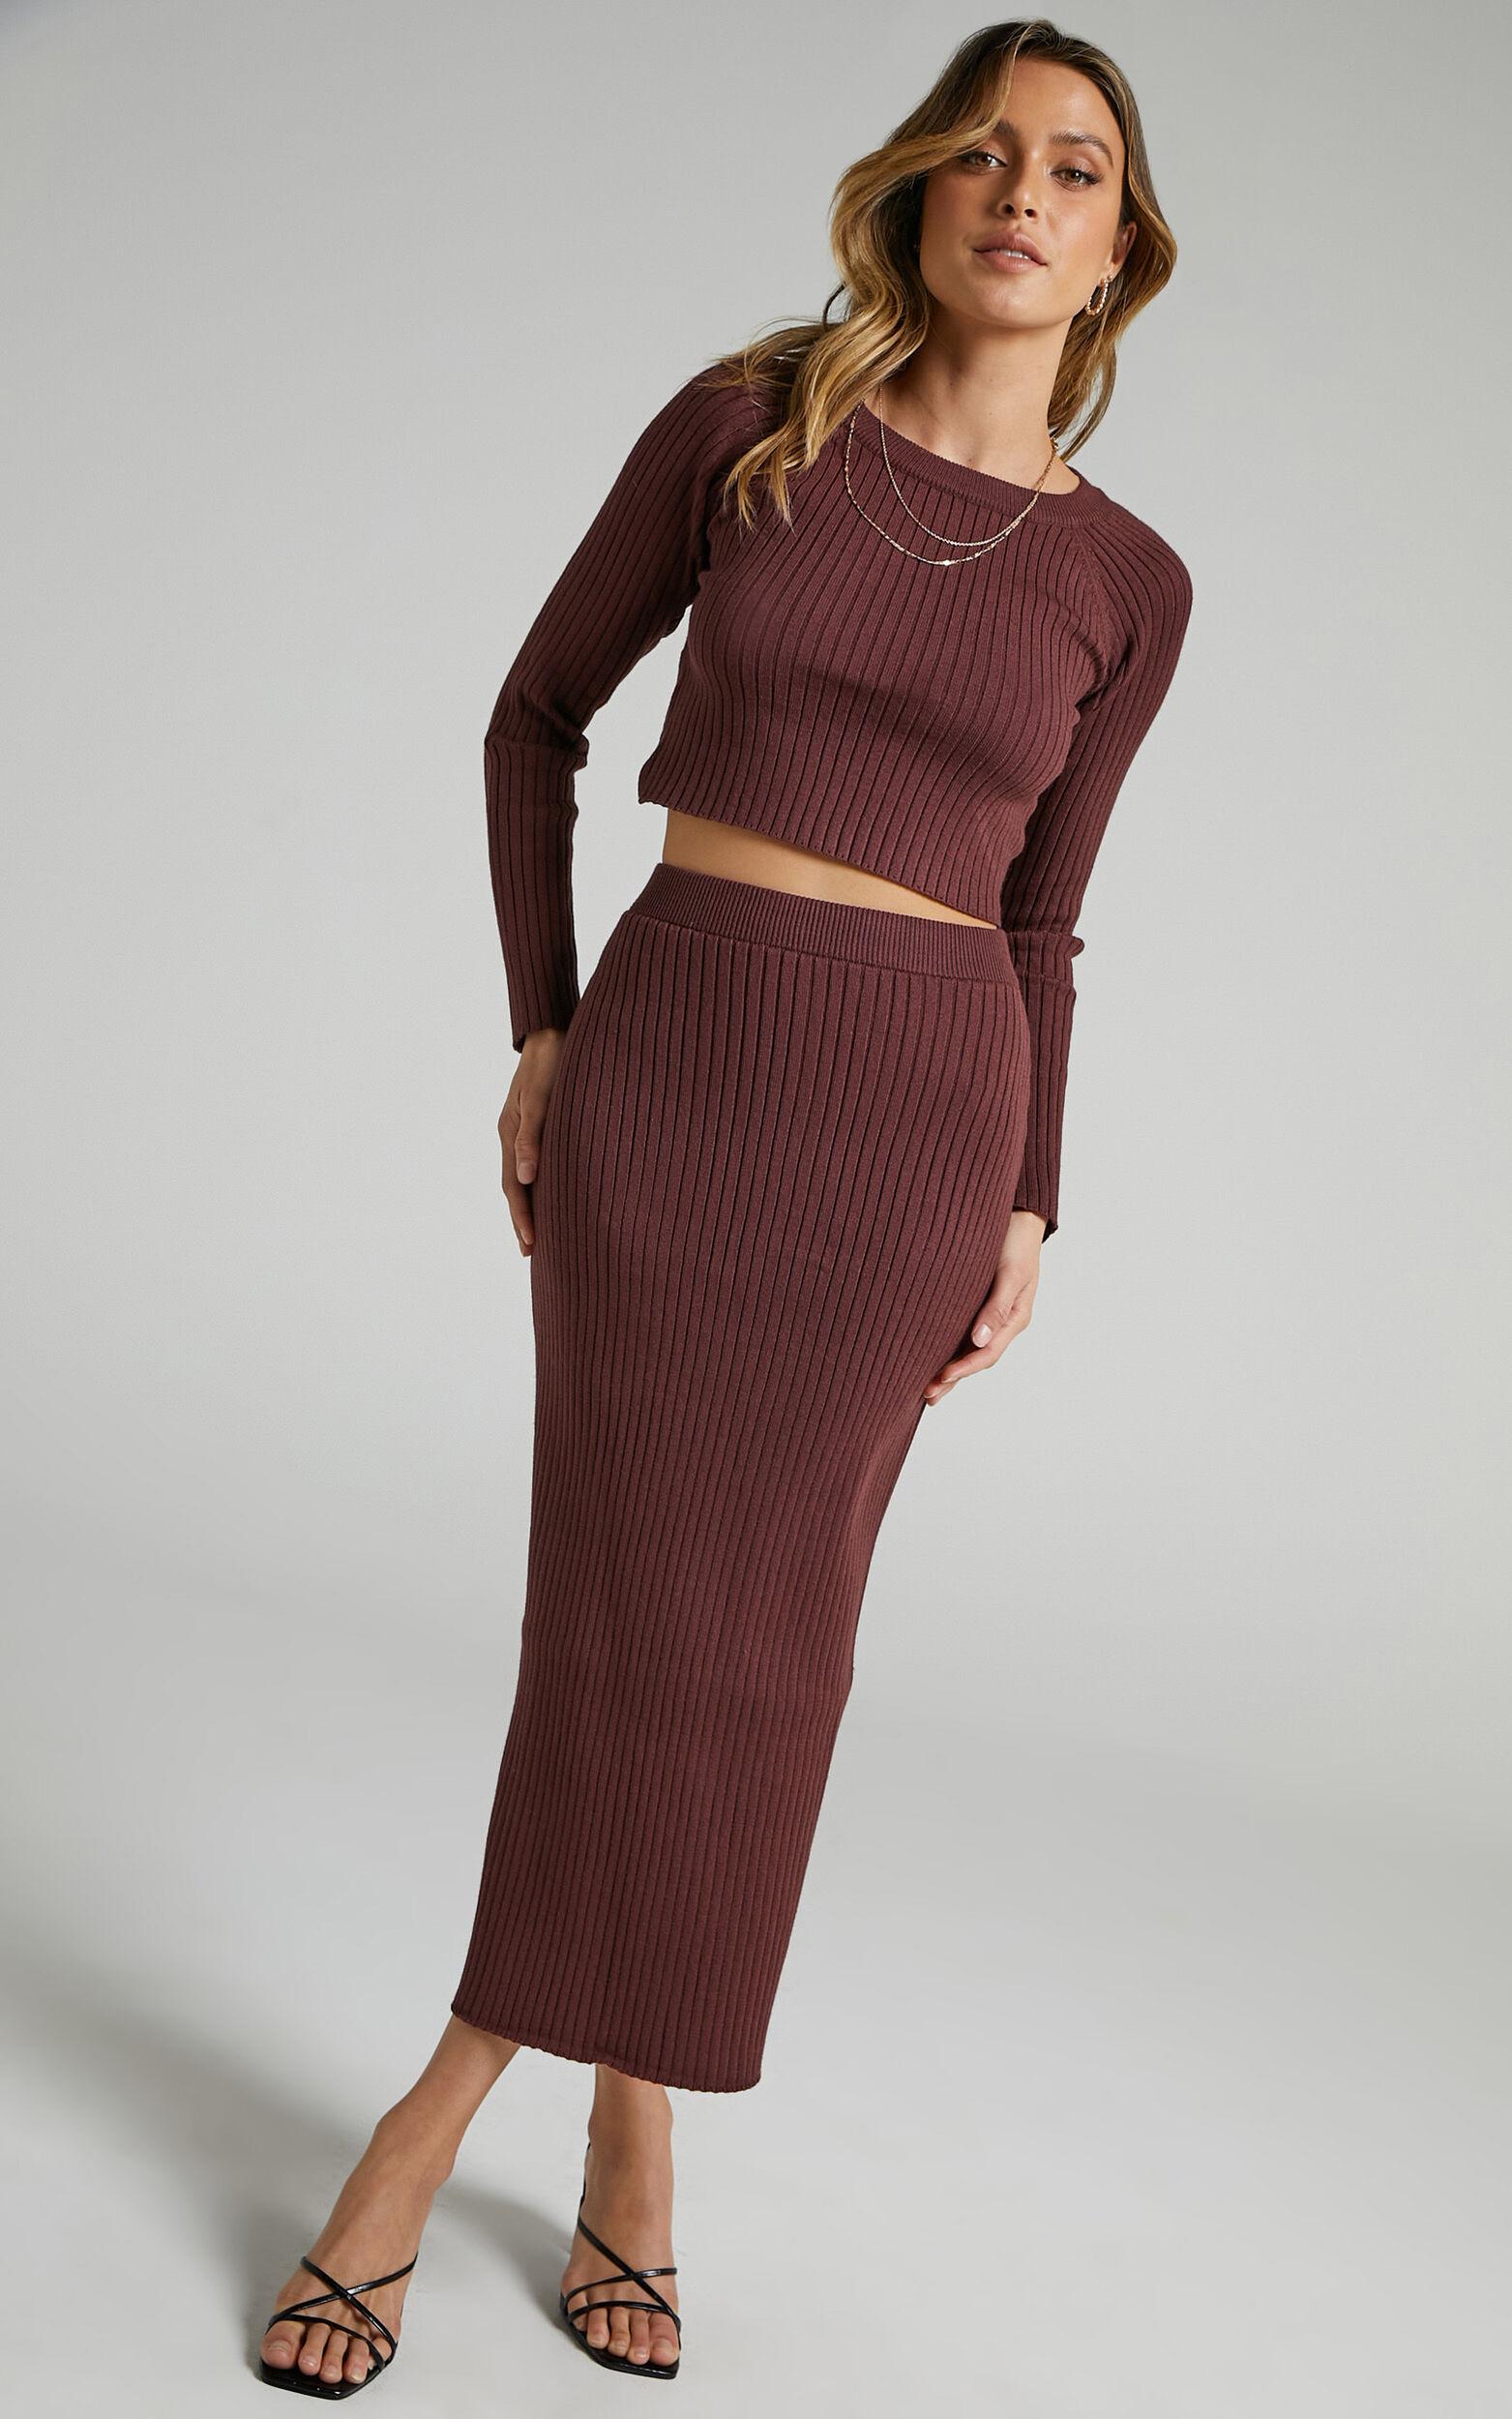 Yolanda Midi Knit Skirt in Chocolate - L, BRN1, super-hi-res image number null